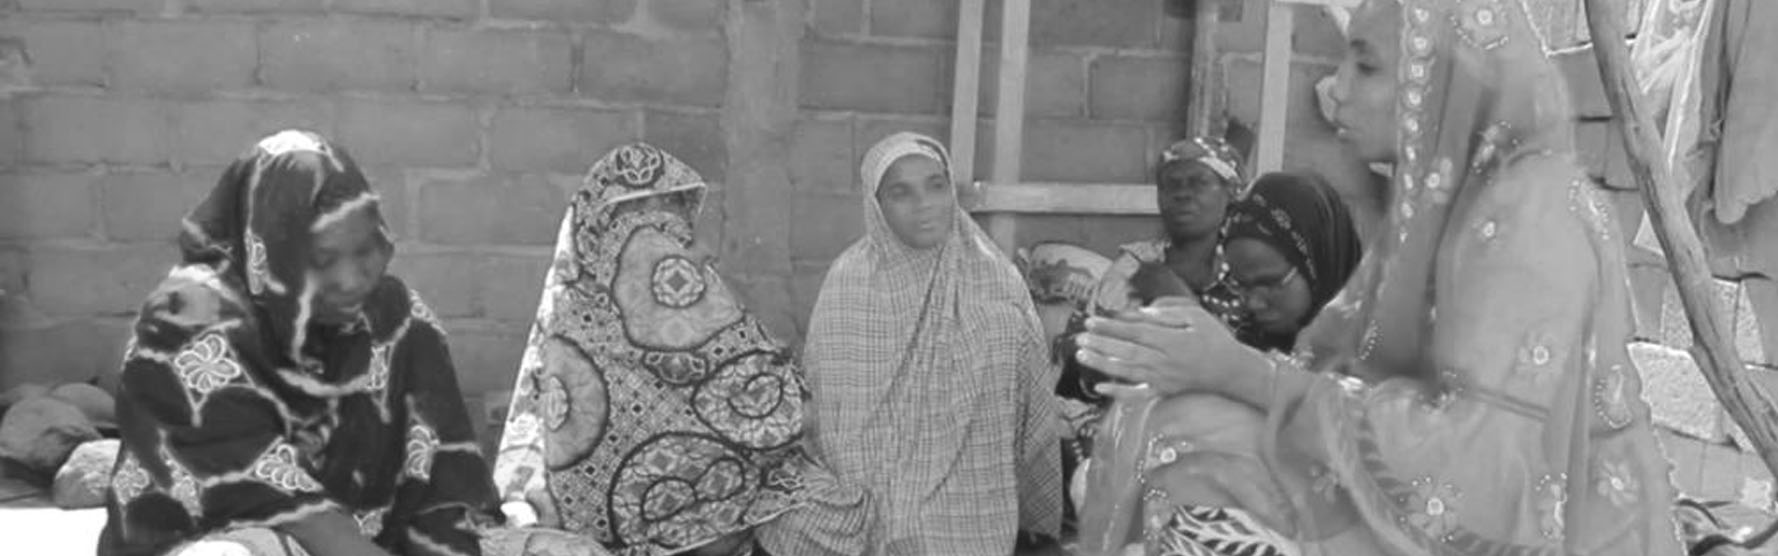 Editor's Choice: Cameroon: Child marriage – raising awareness